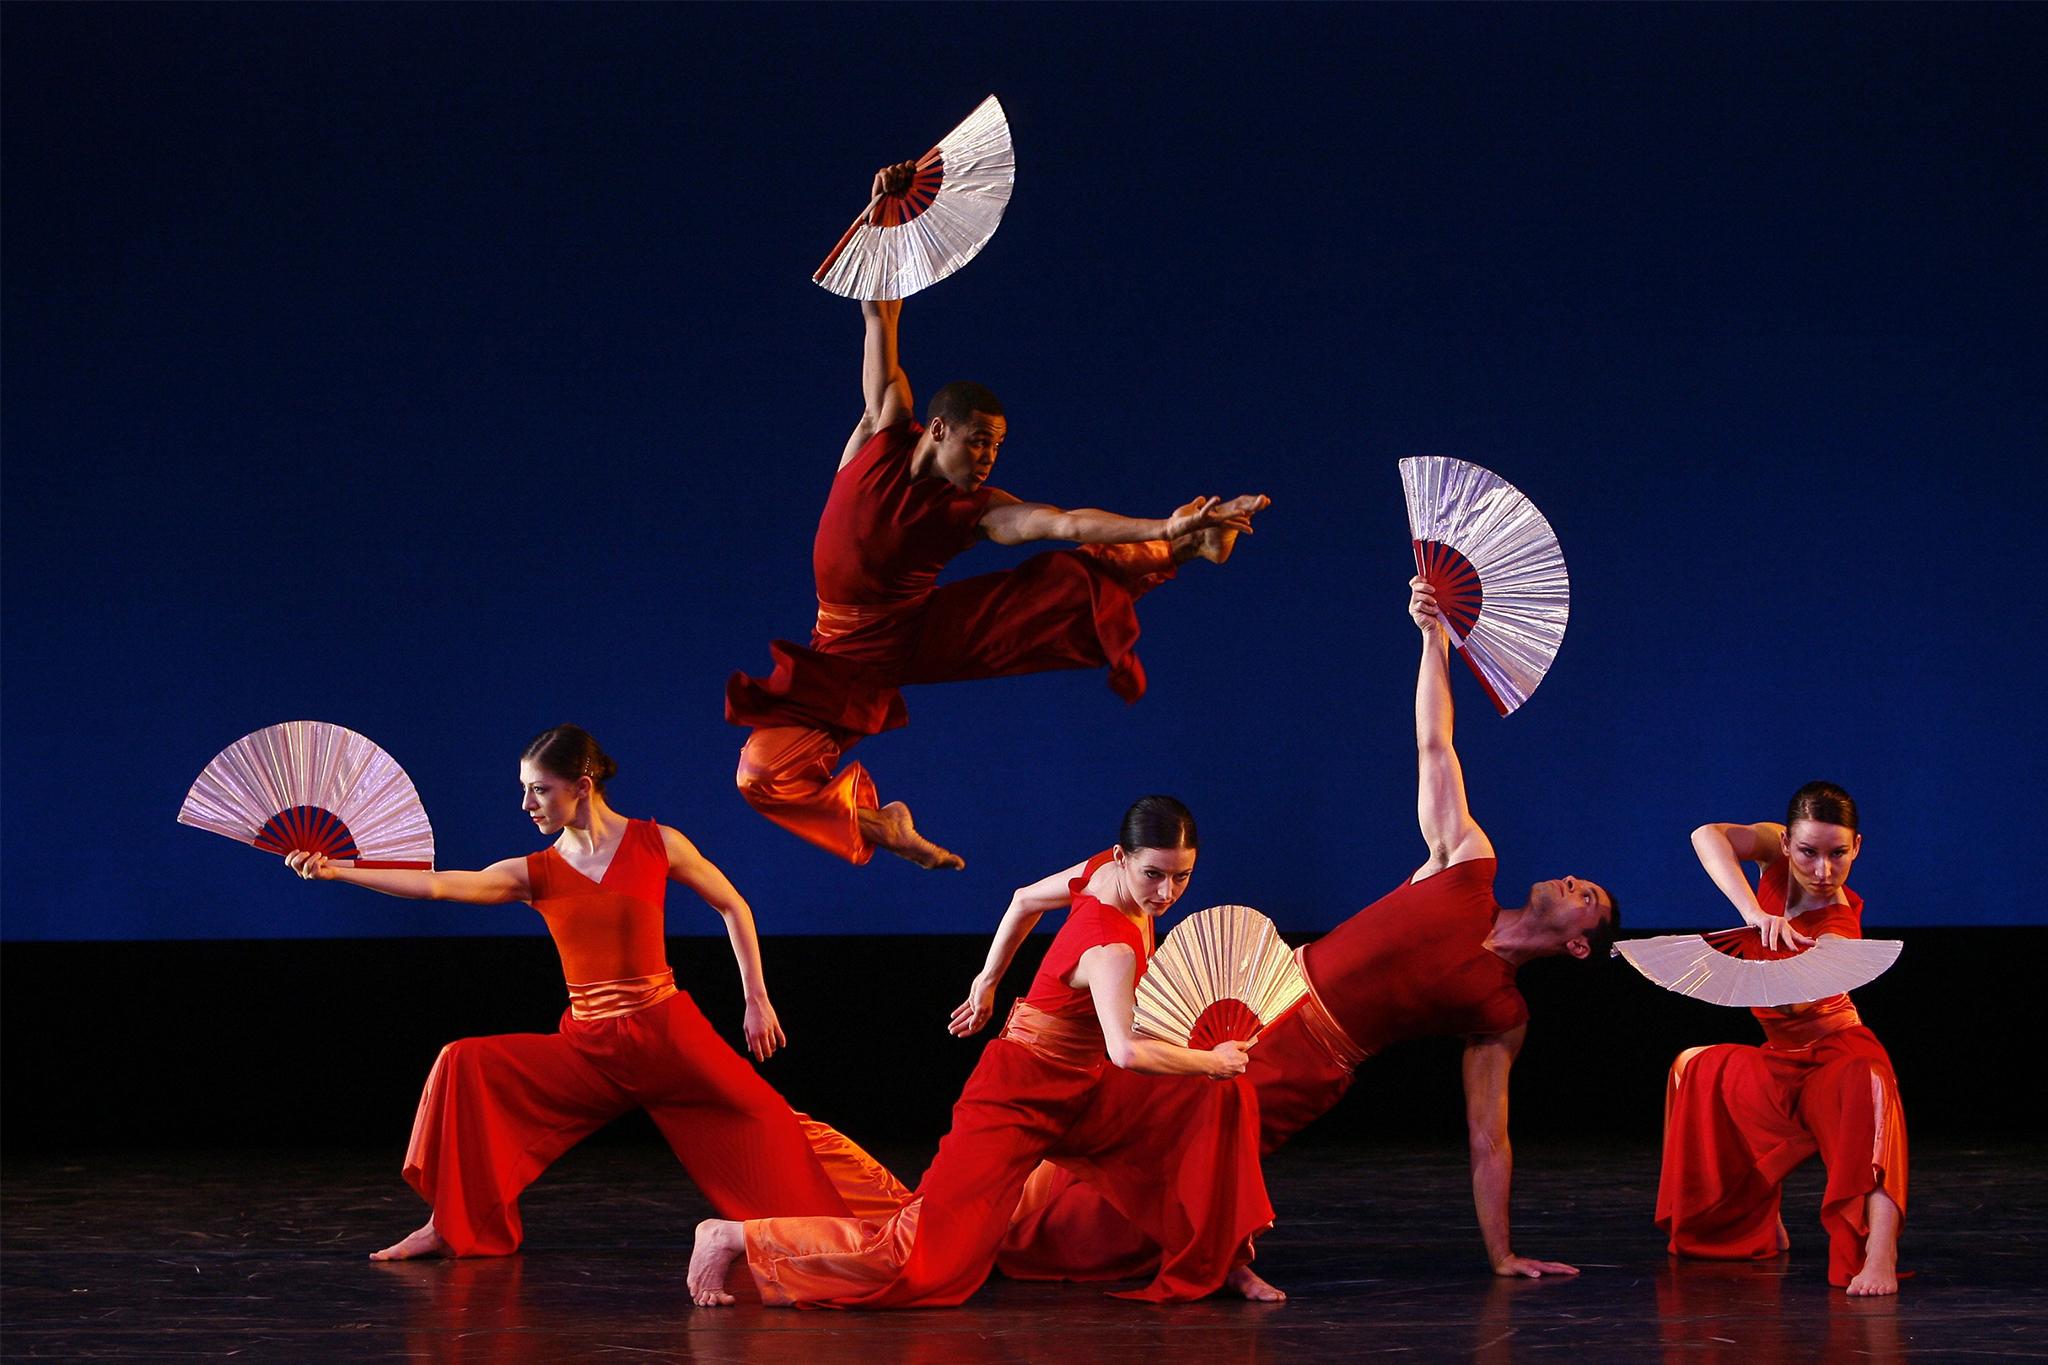 Nai-Ni Chen Dance Company presents a Lunar New Year Celebration